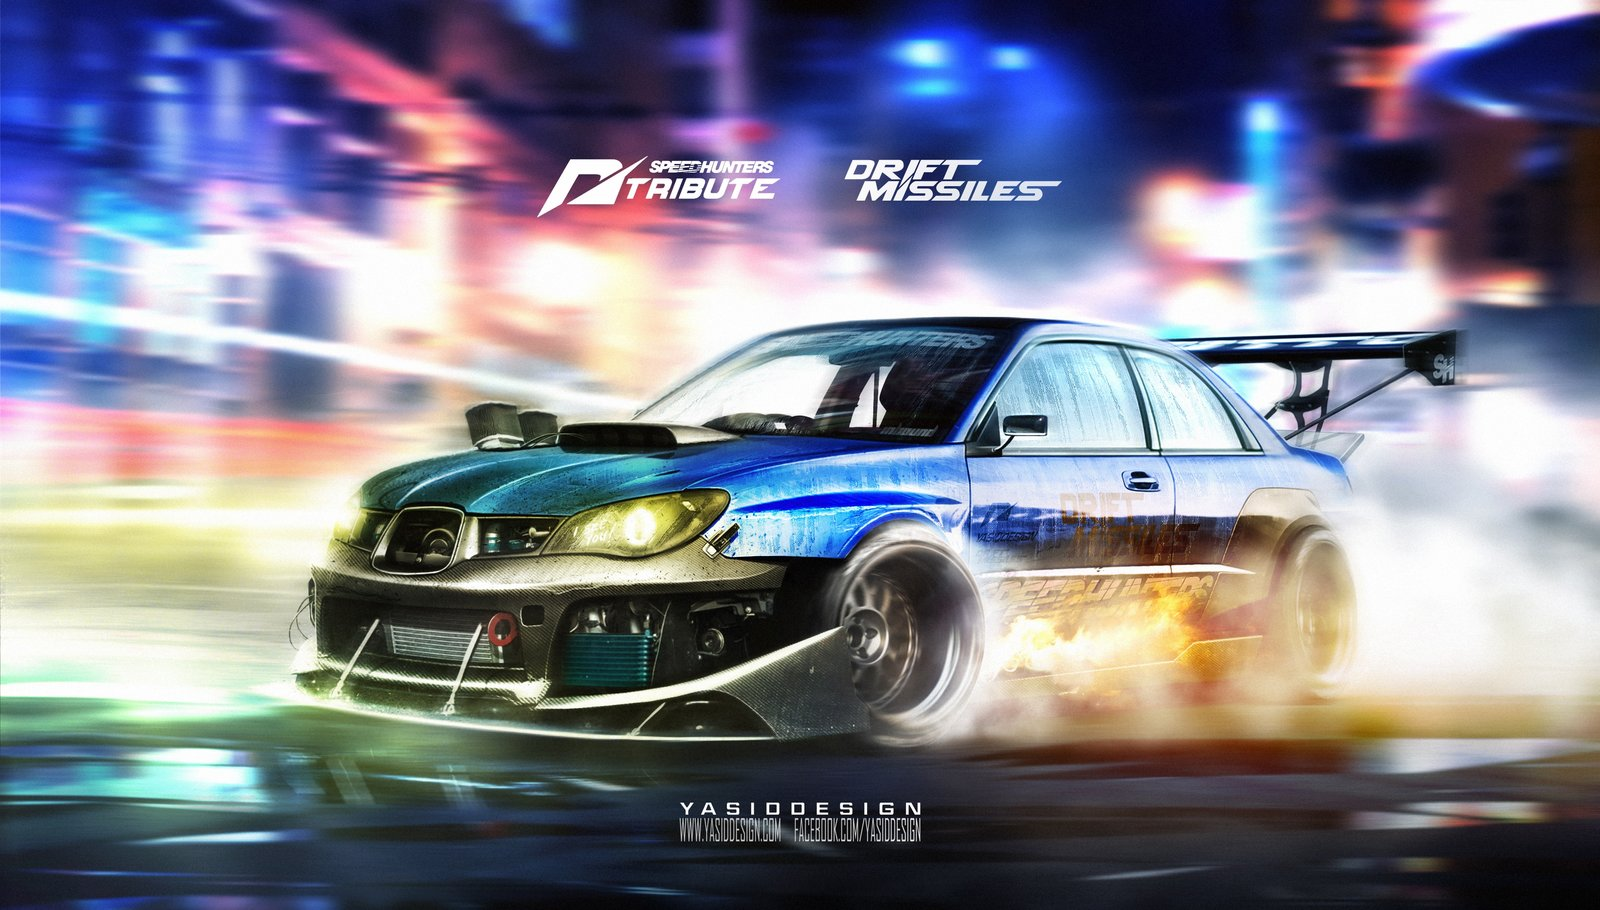 Speedhunters Subaru Impreza STI _ Need for speed Tribute _ Drift missile